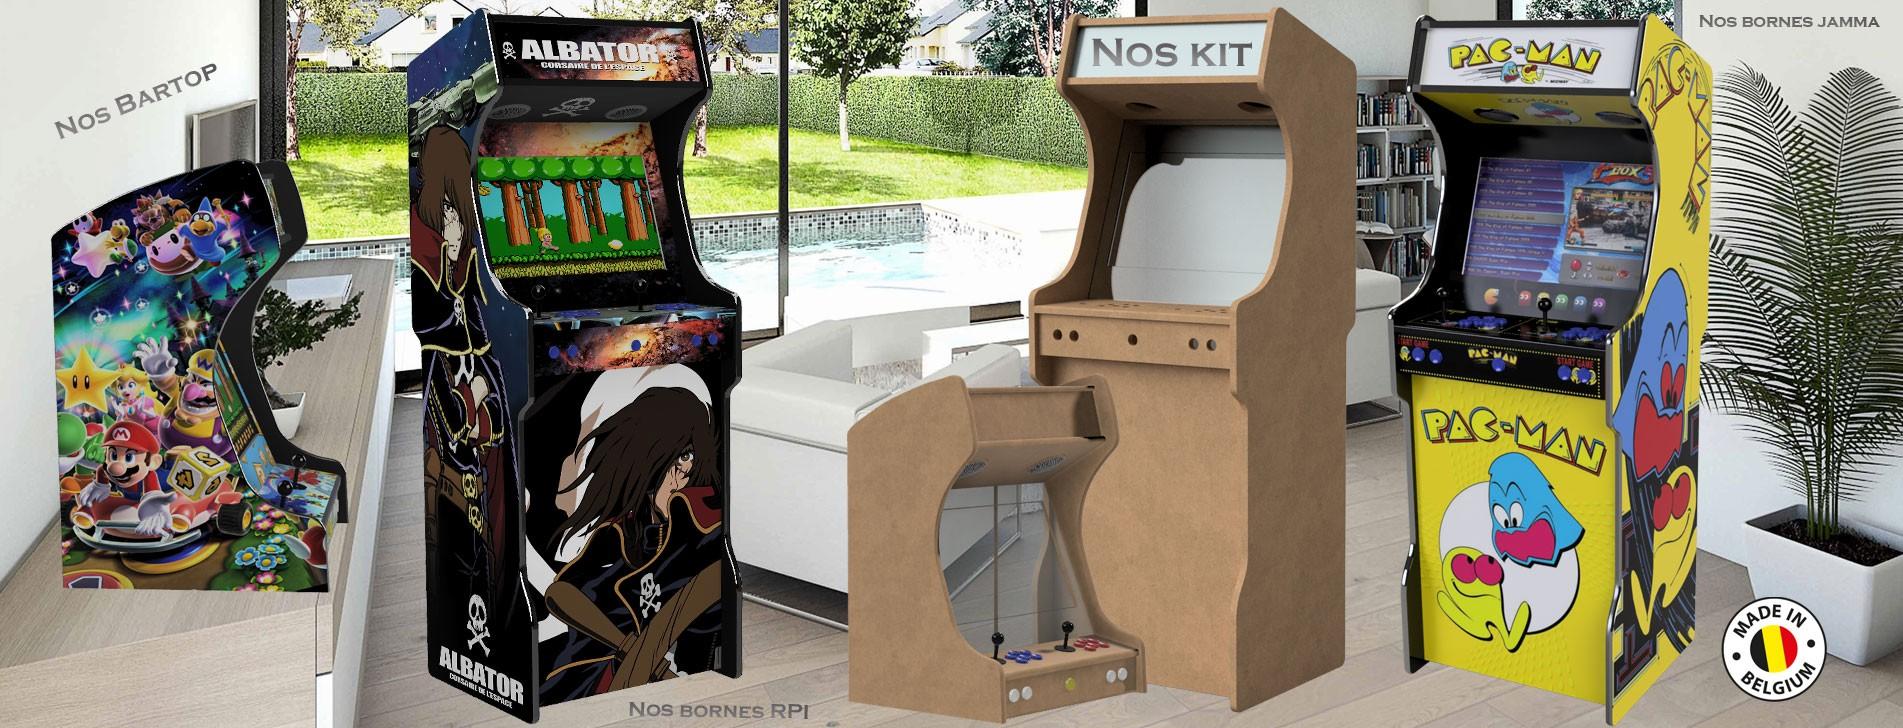 Nos bornes arcade